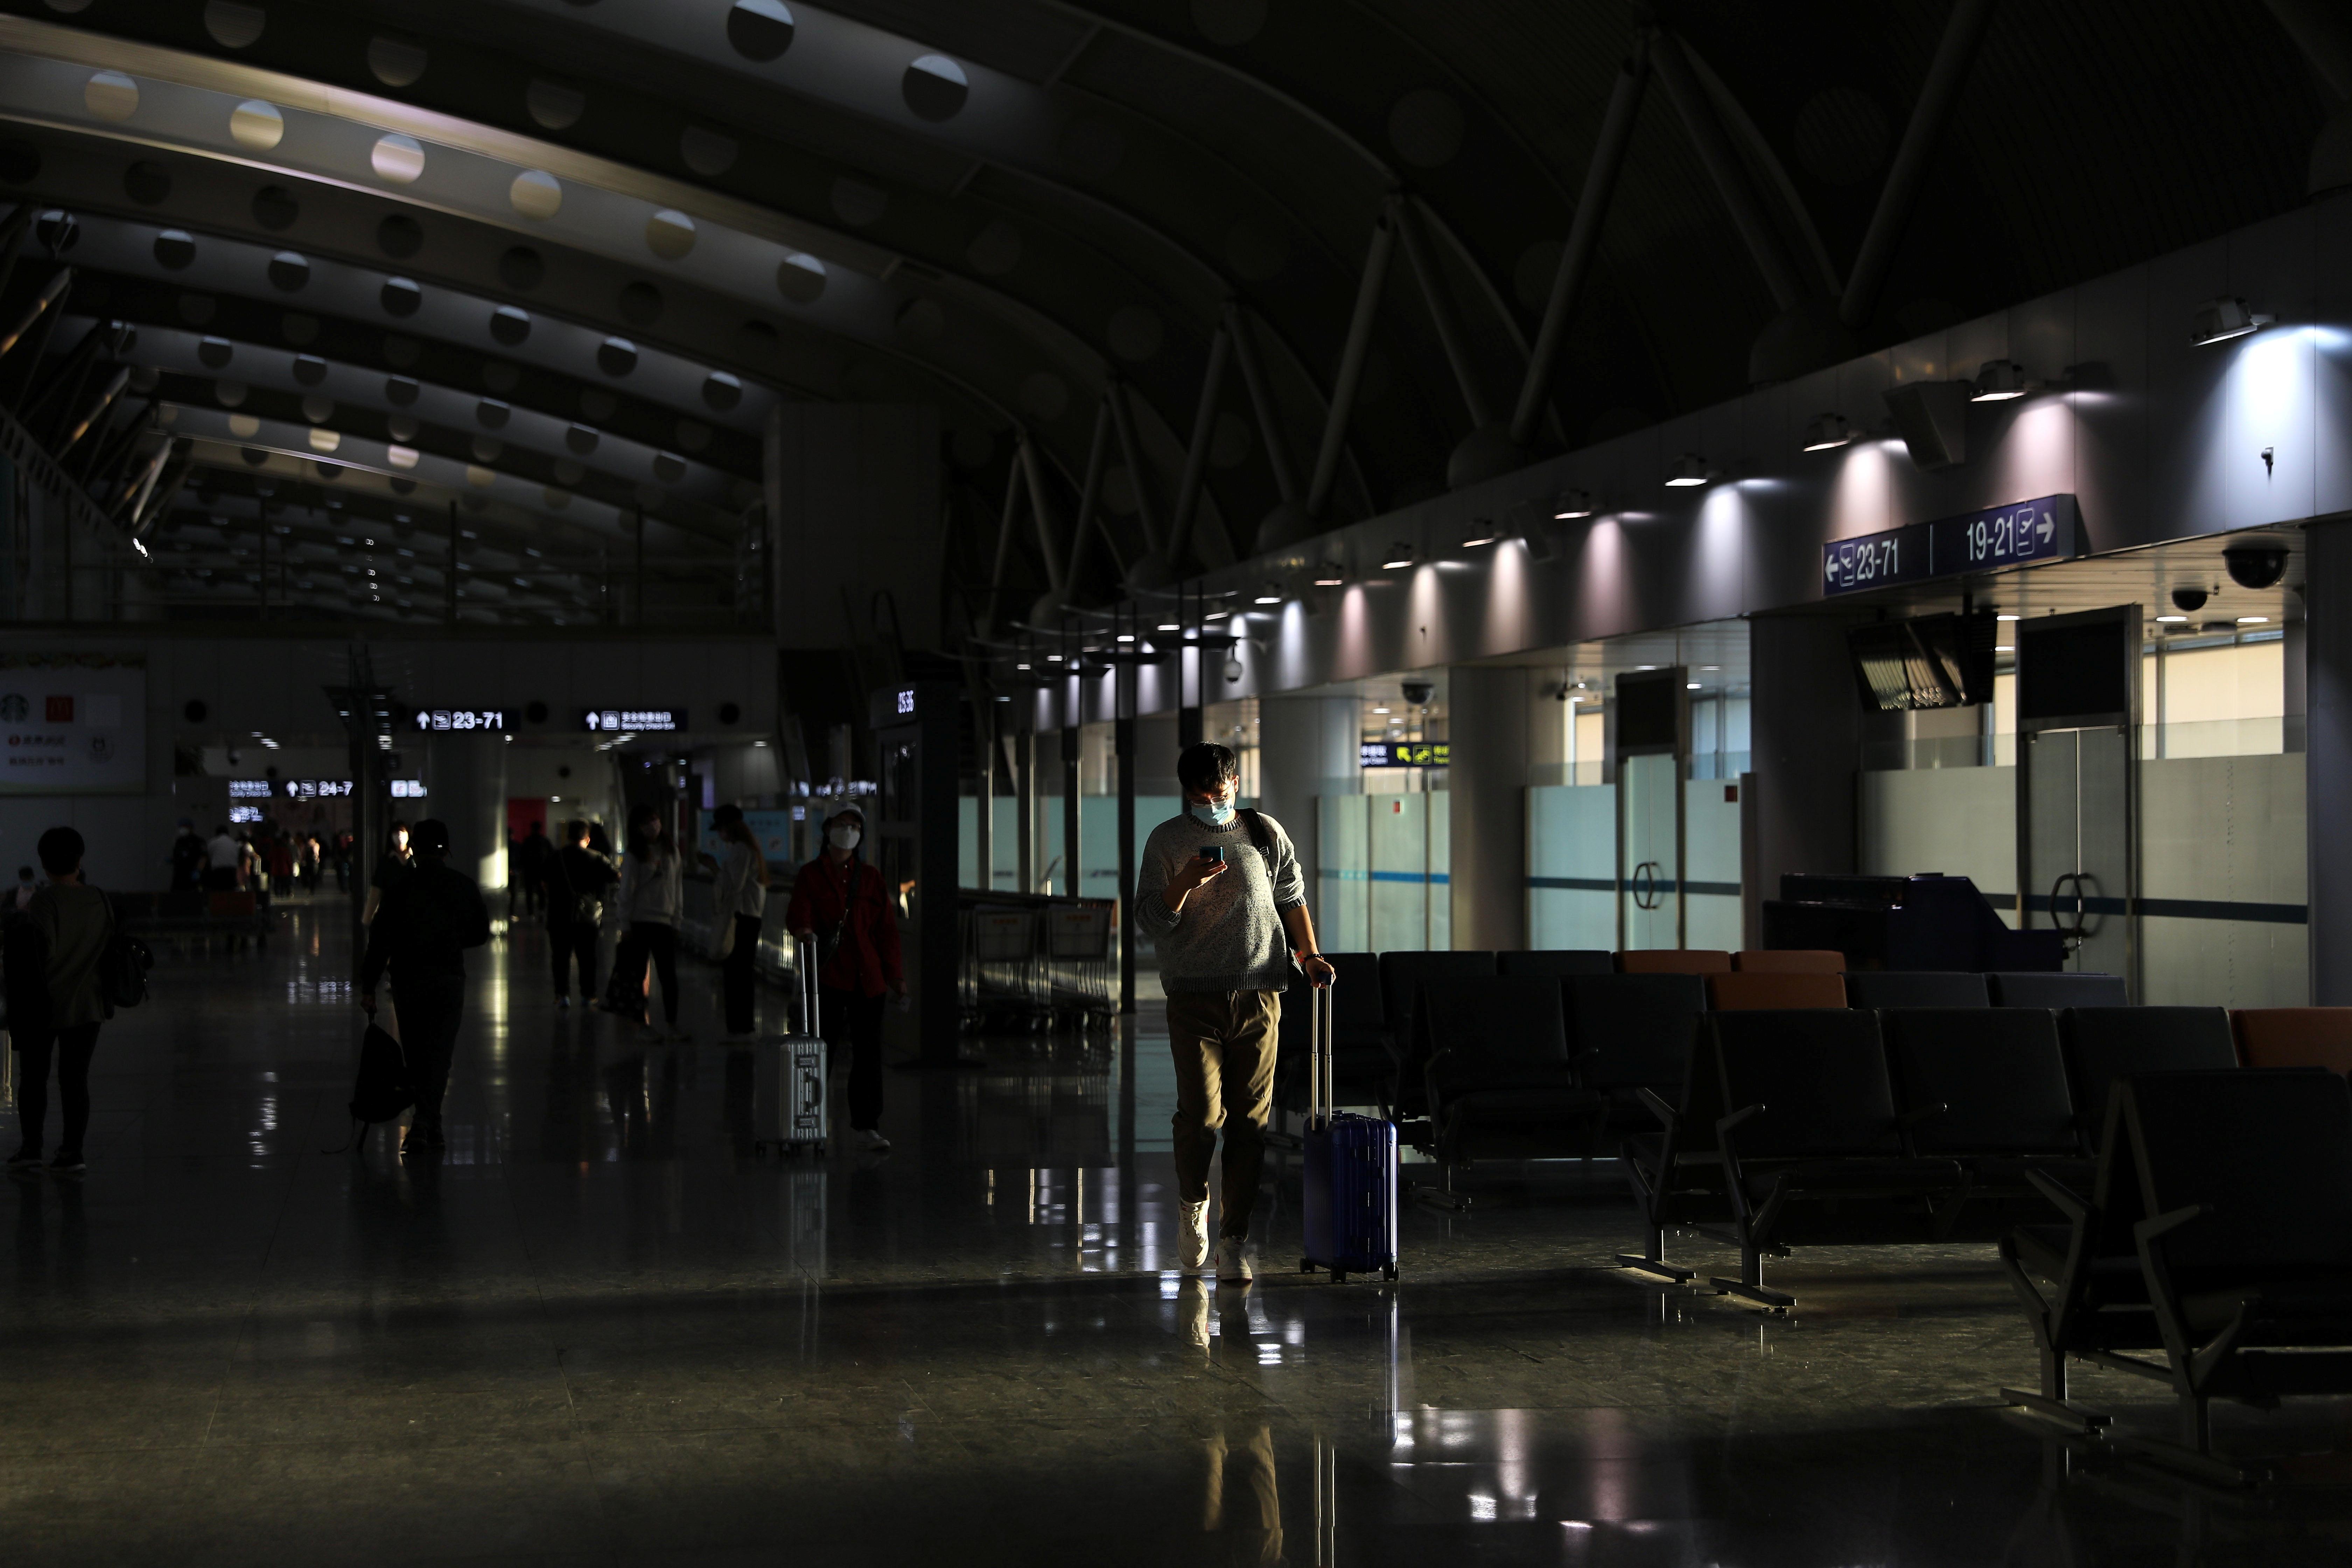 A traveller walks at the Beijing Capital International Airport in Beijing, China May 9, 2021. REUTERS/Tingshu Wang